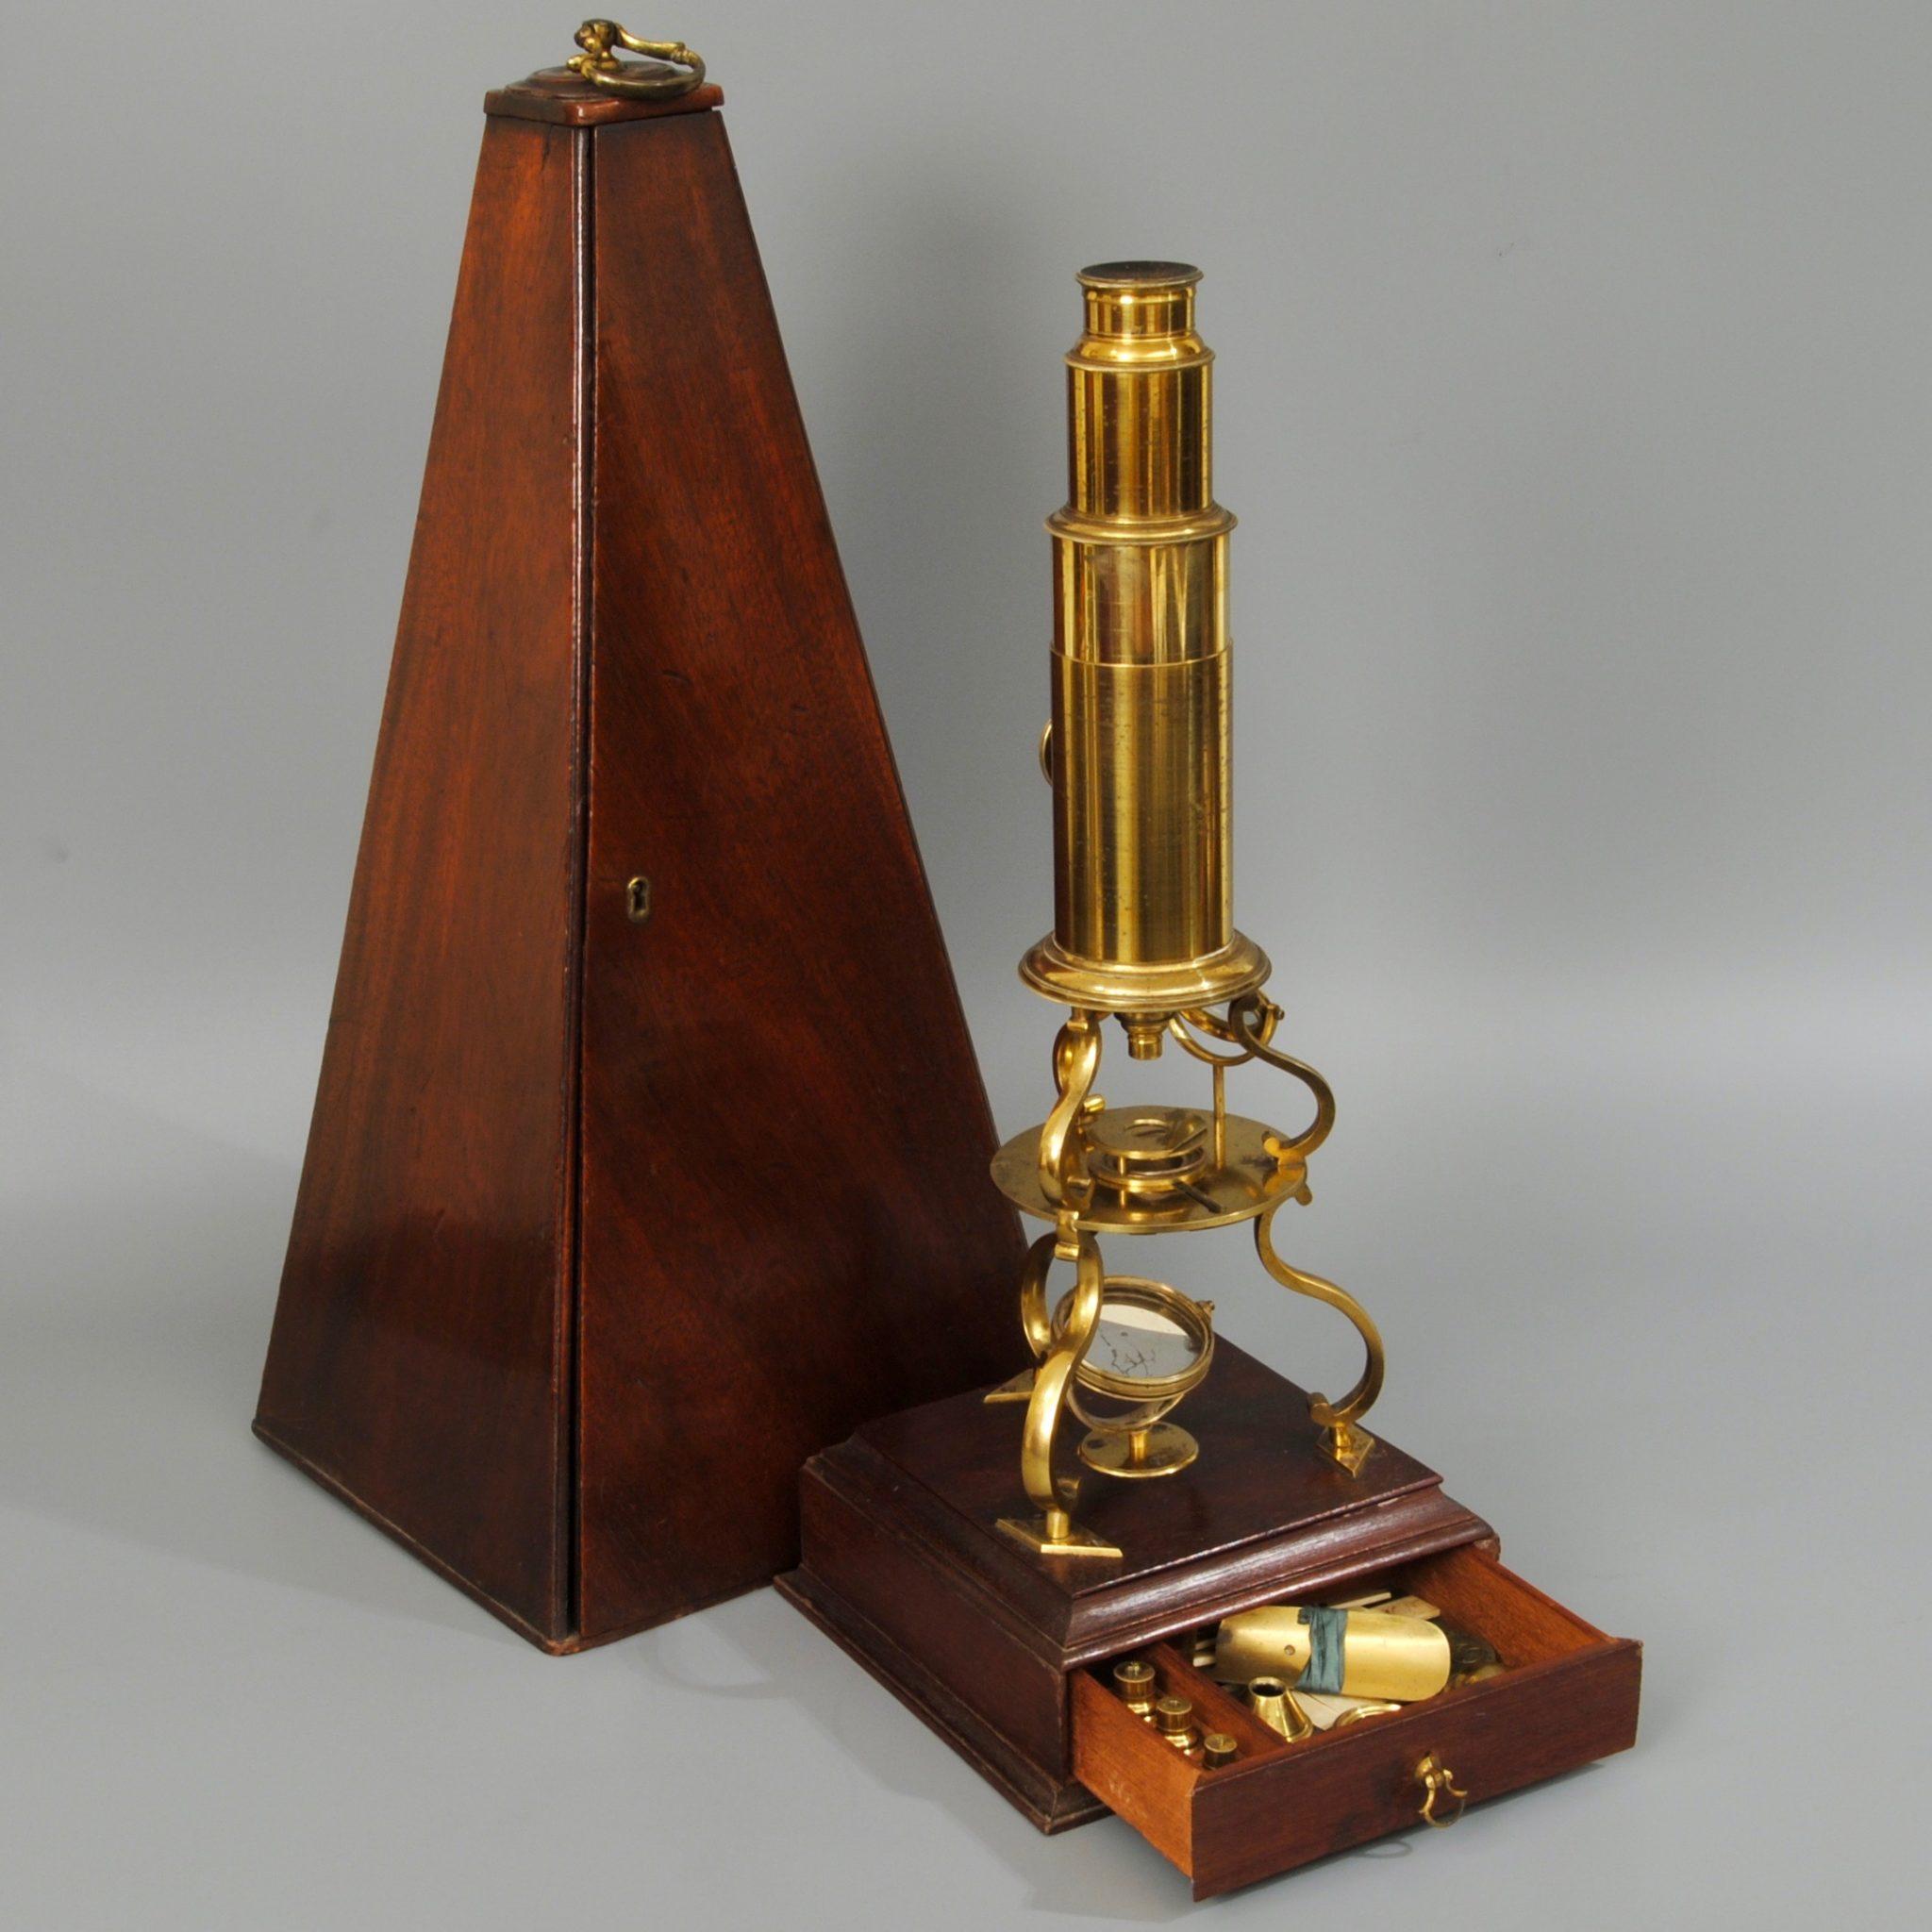 An 18th century Culpeper microscope by Adams London